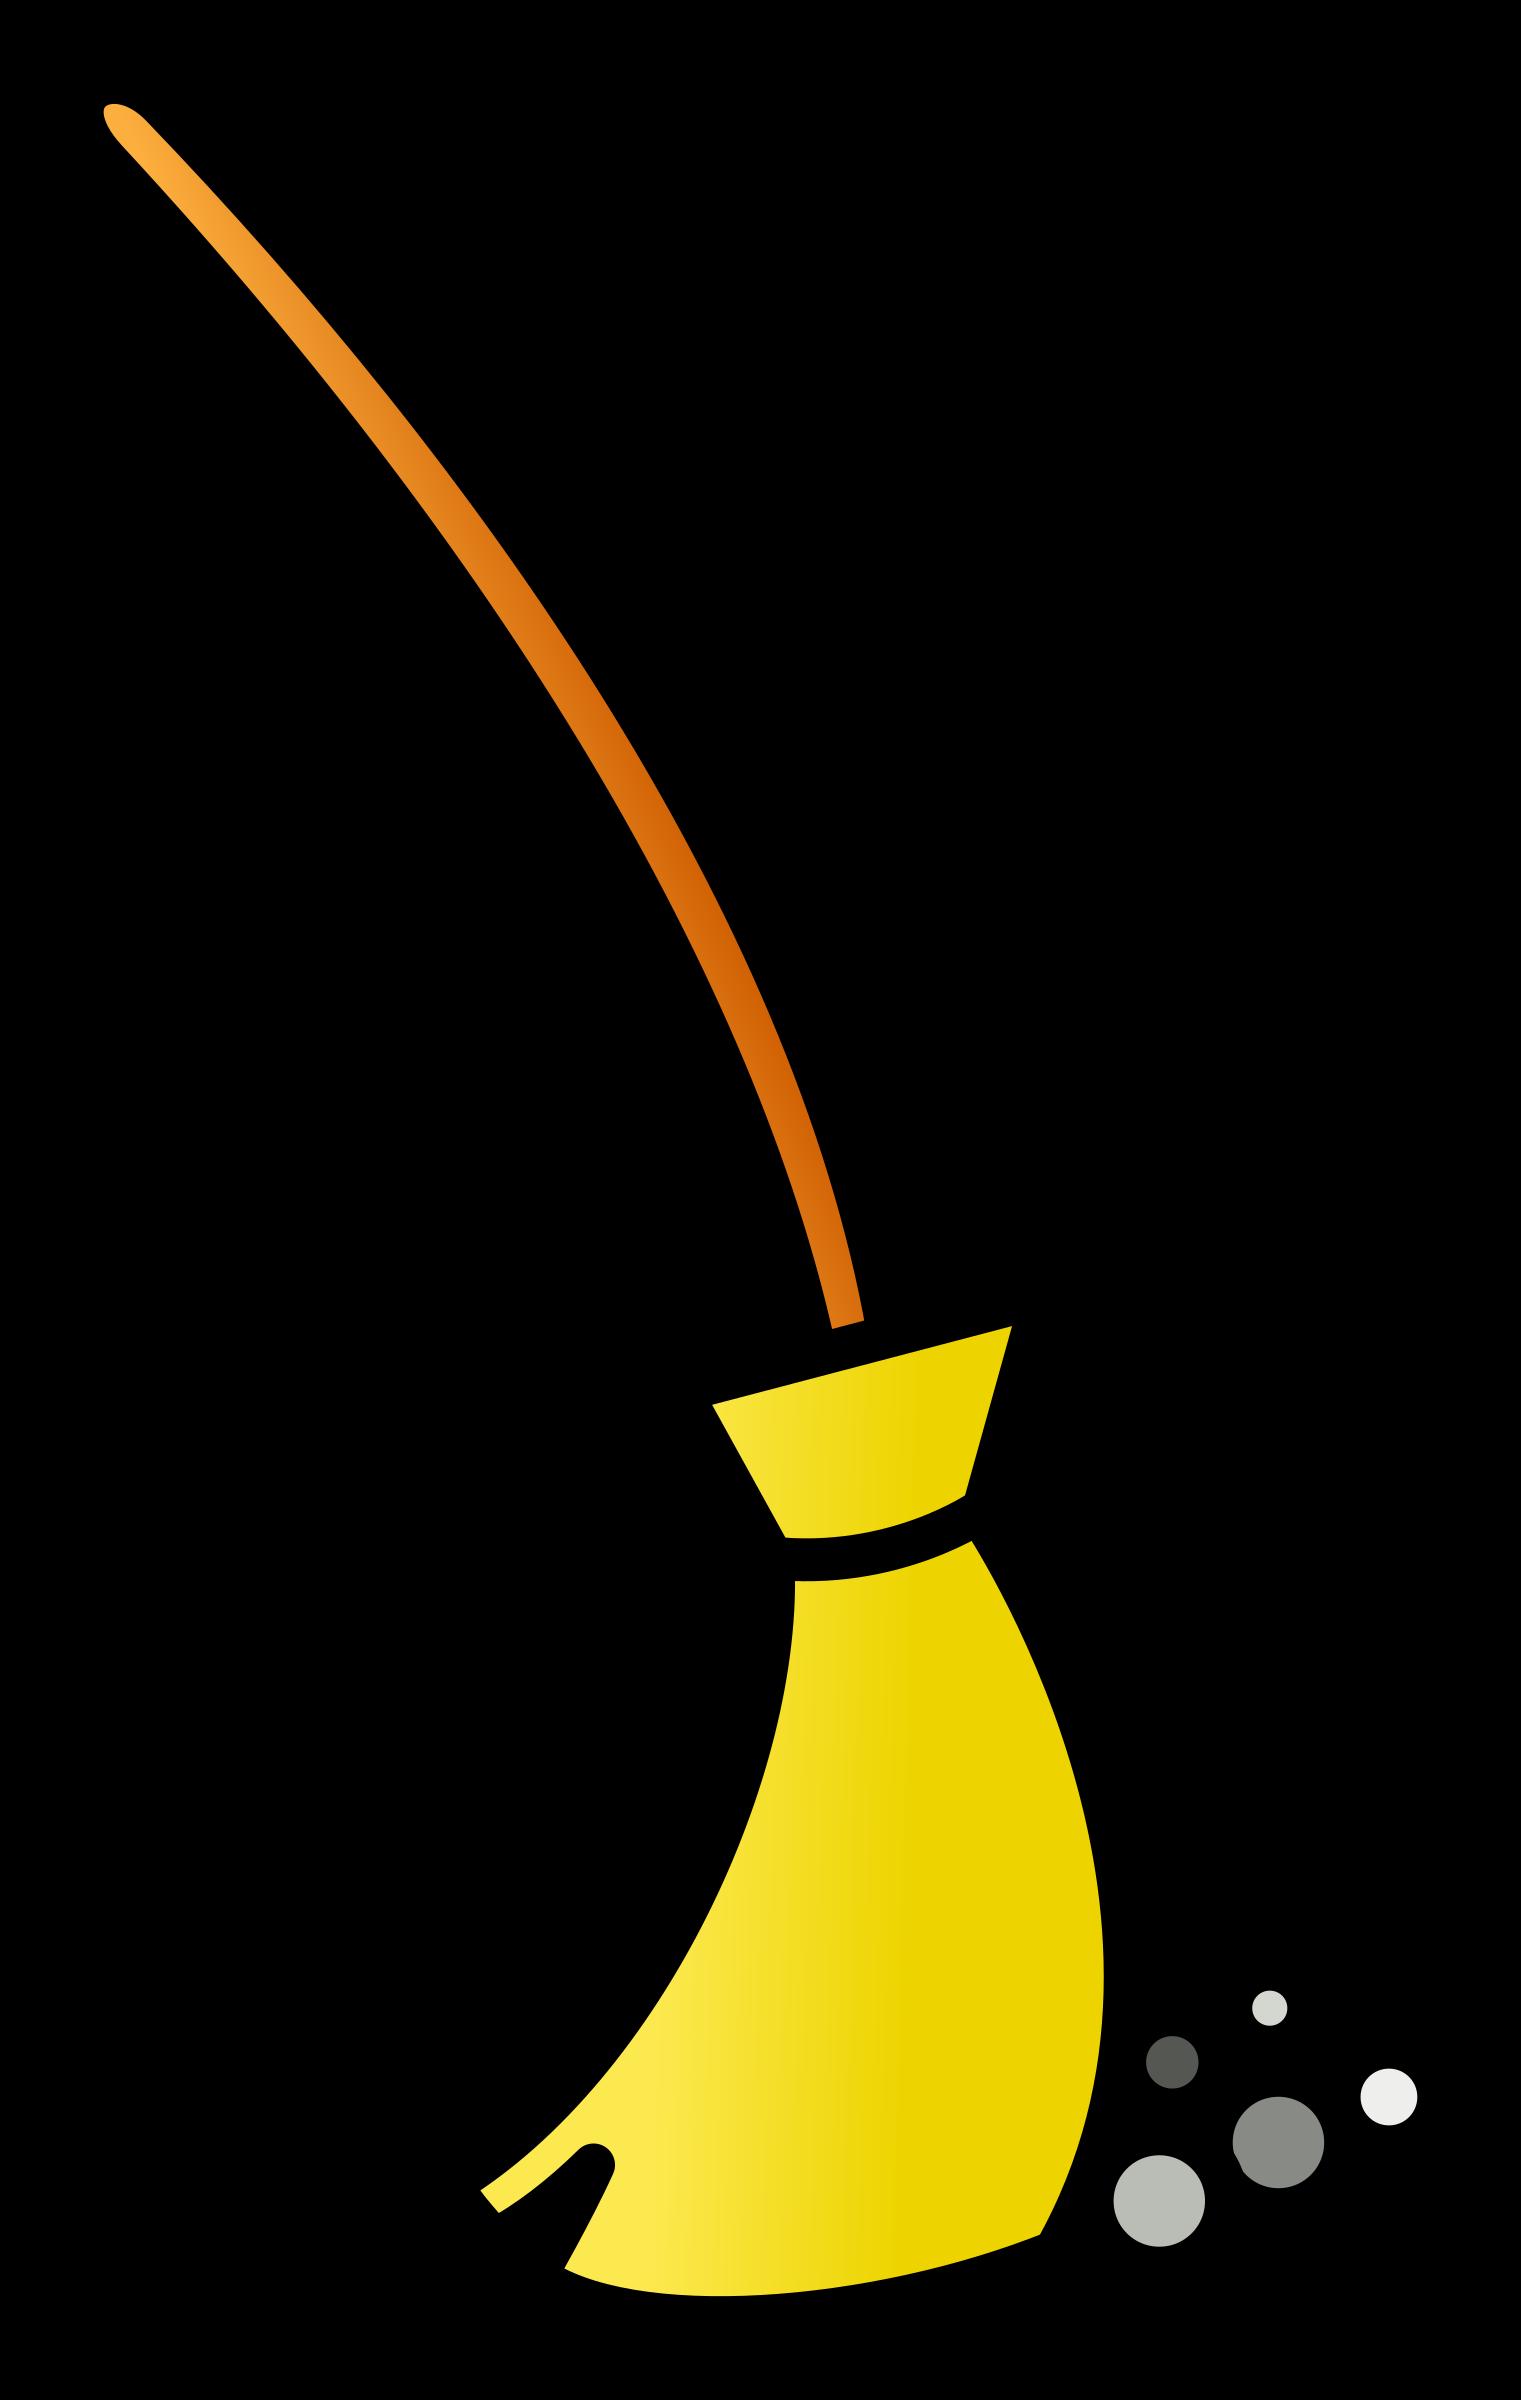 Clipart broom